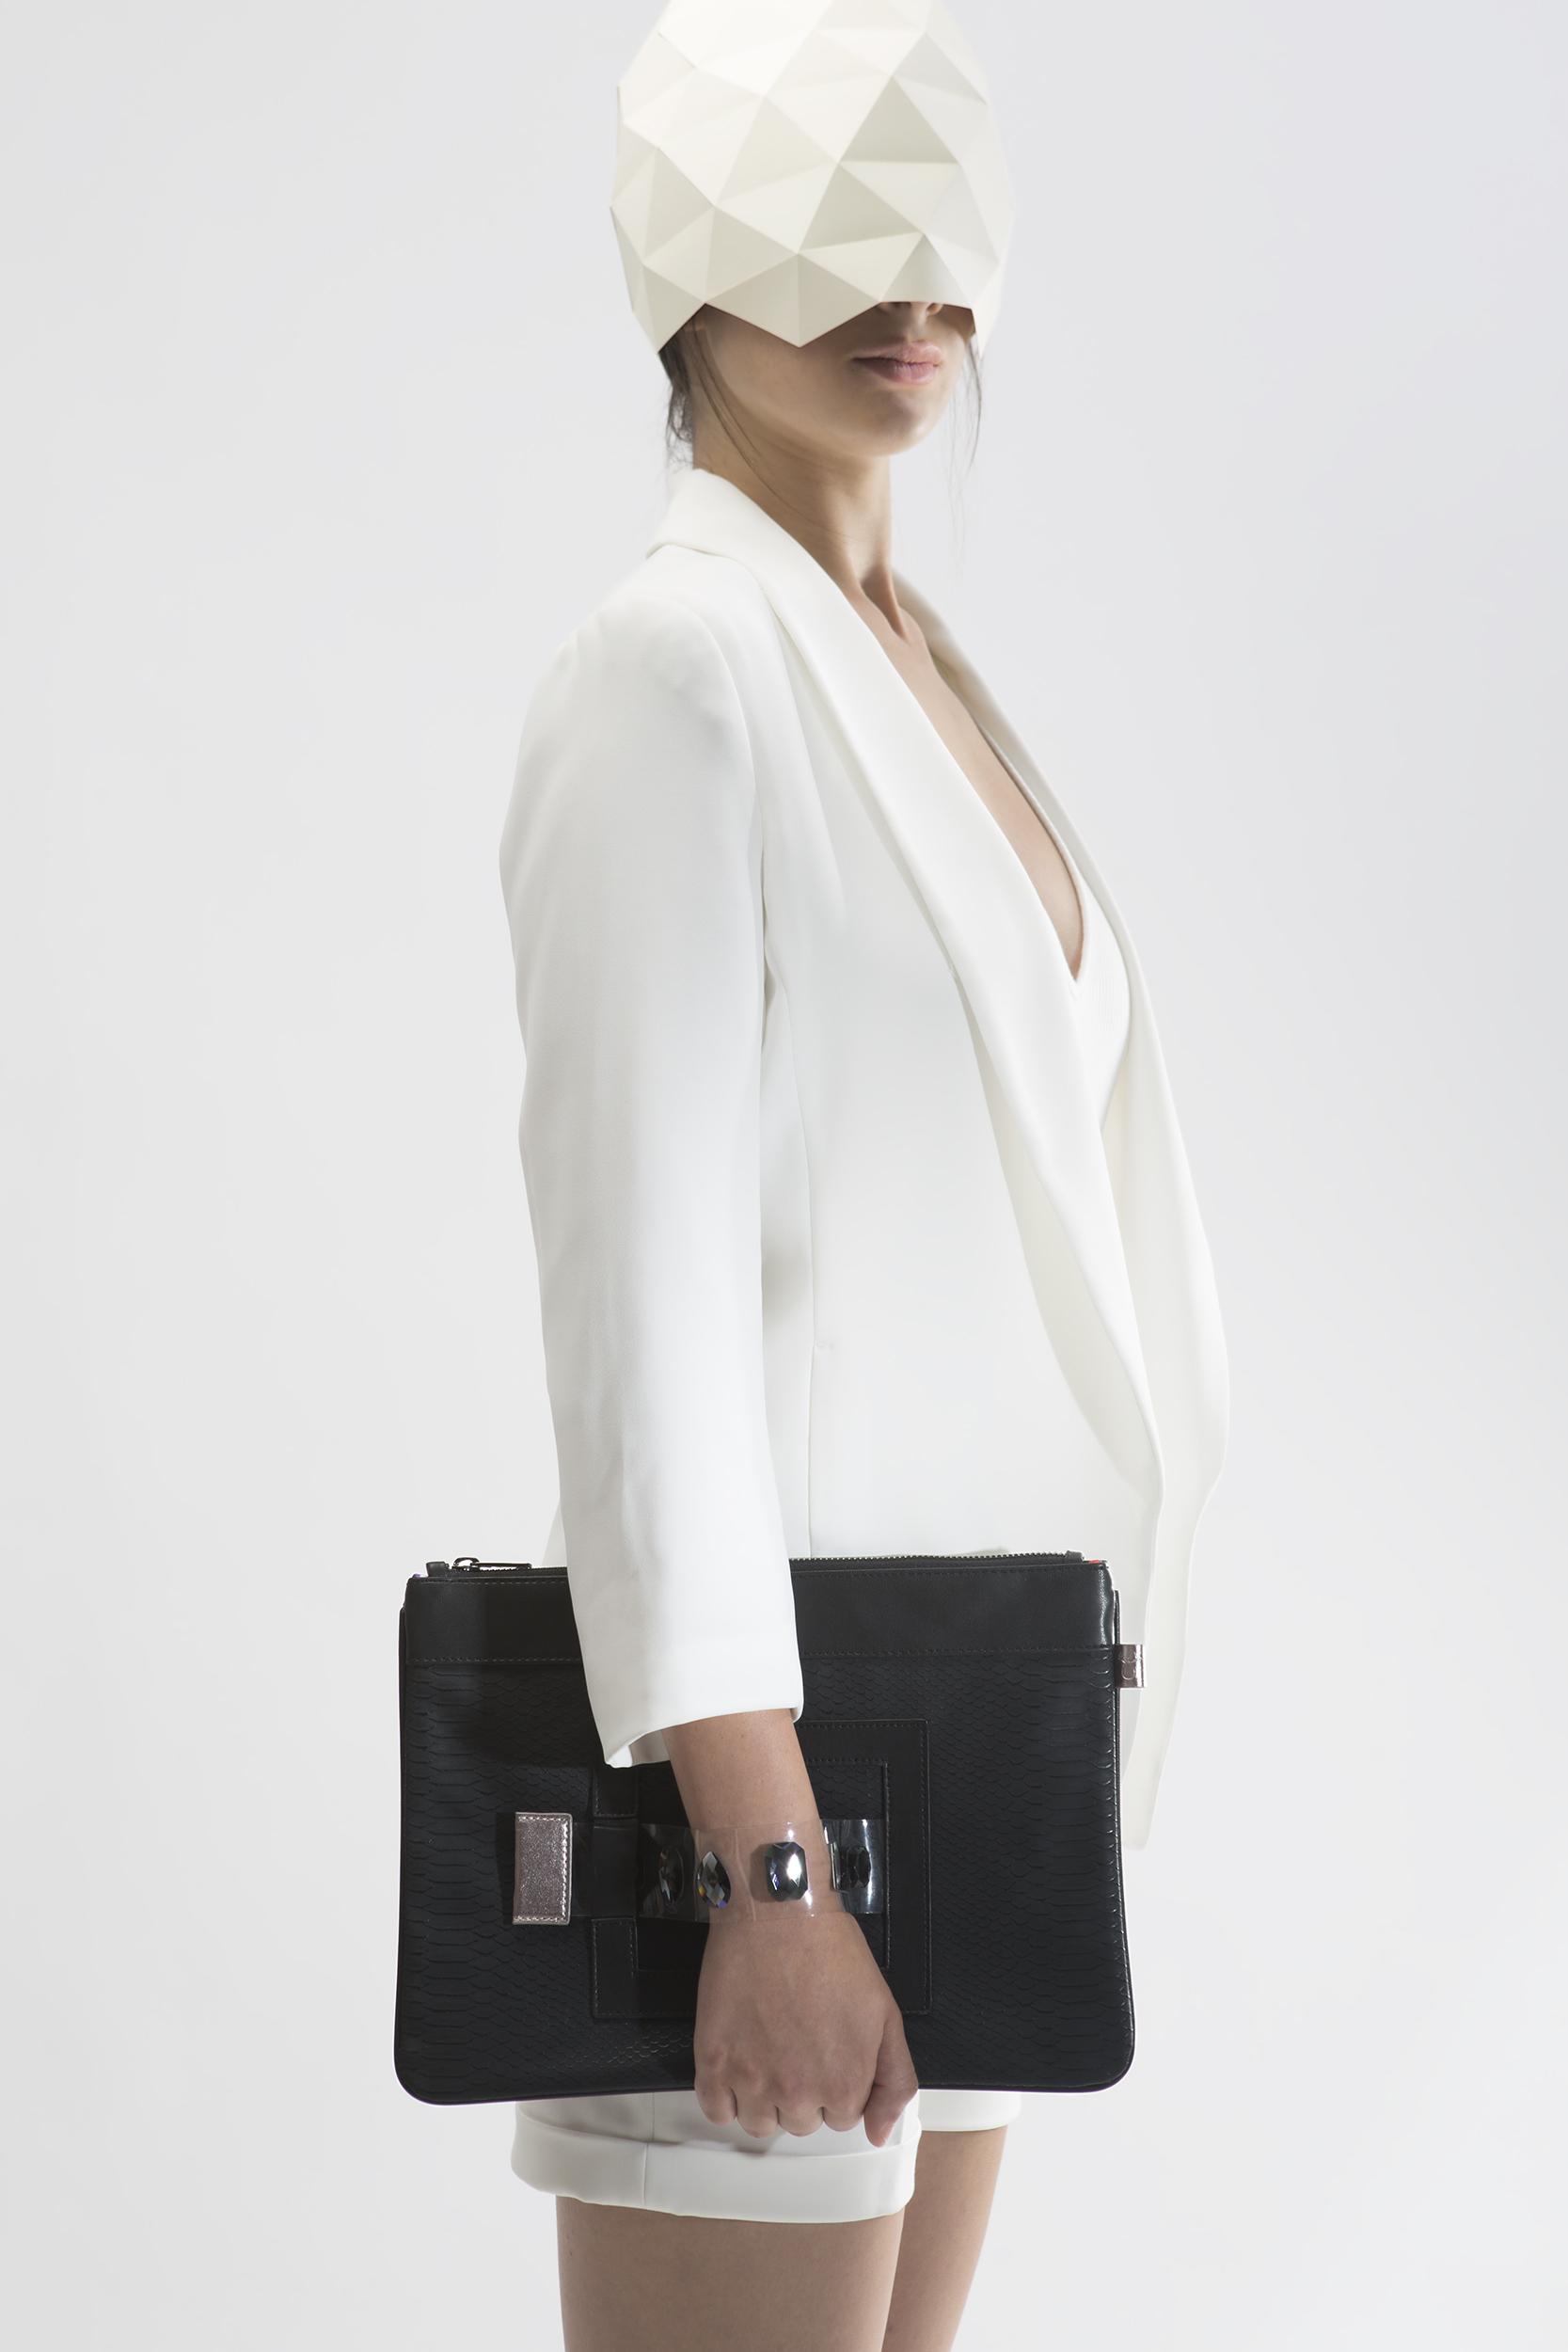 FruitenVeg-GEMA bag-eco-vegan-leather-luxury-tablet bag-bracelet-clutch-new-york-handbag-designer.jpg